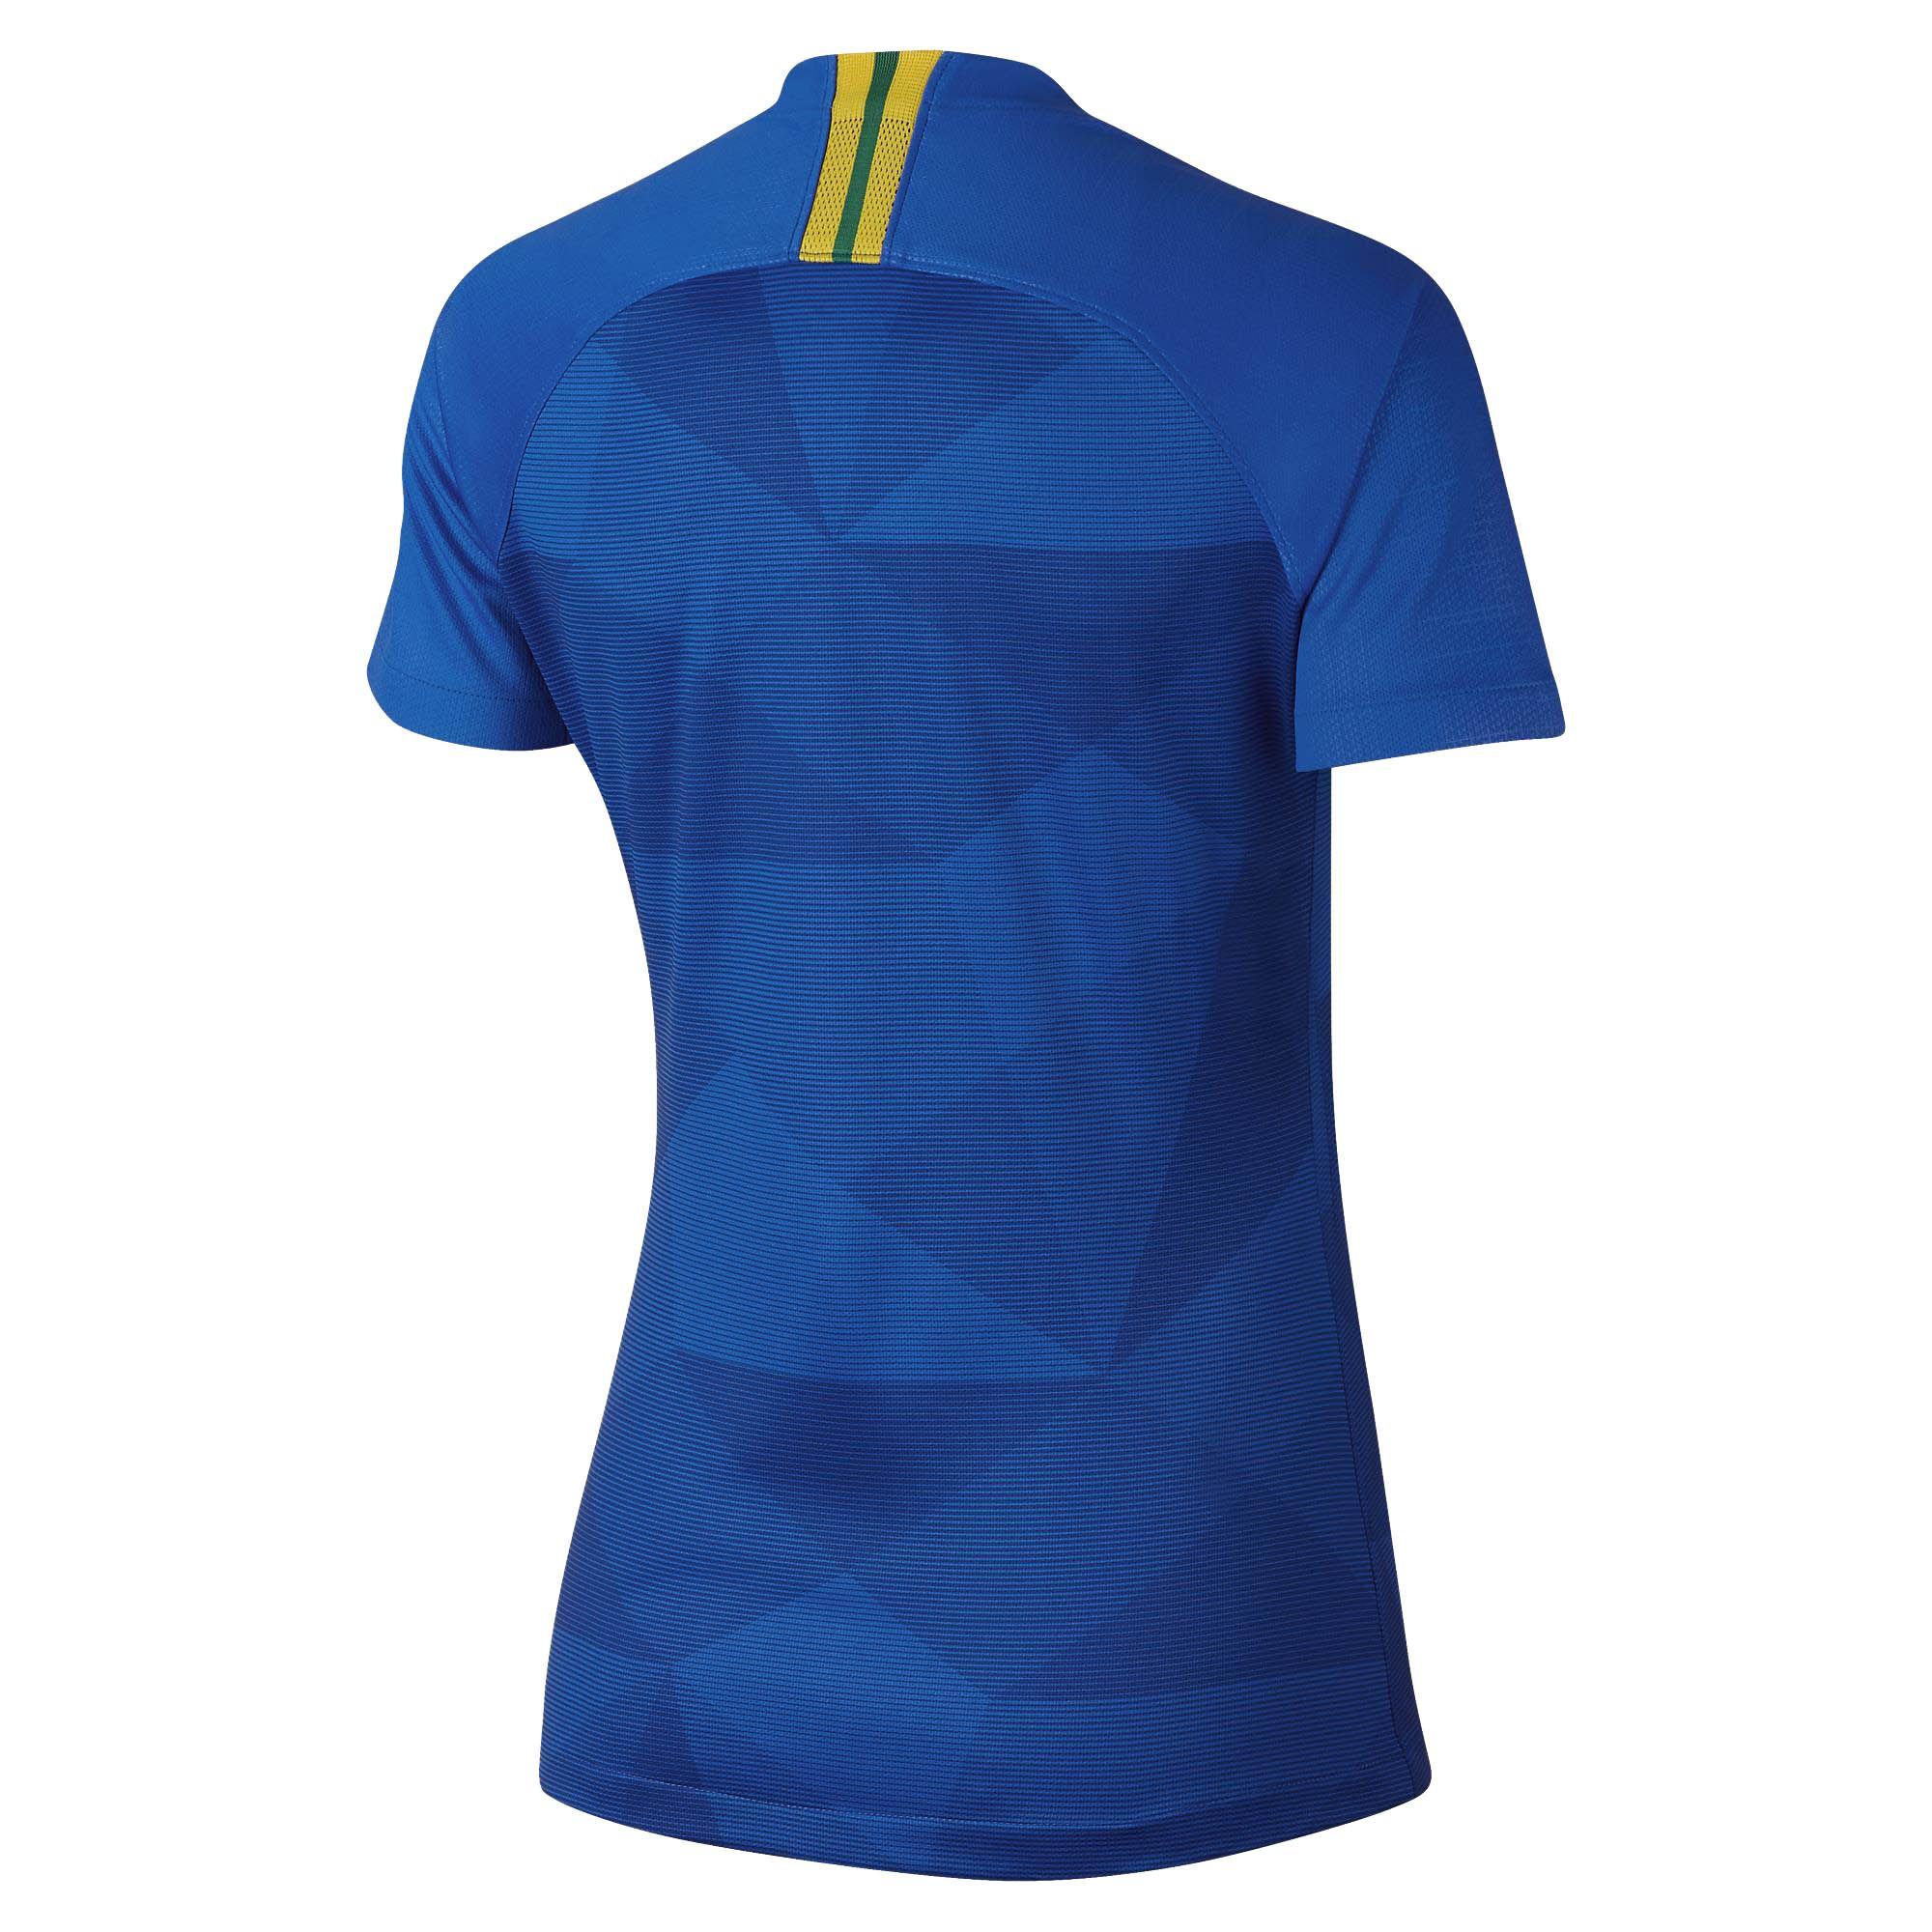 Camisa Seleção Brasil II 2018 s/n° Torcedor Nike Feminina